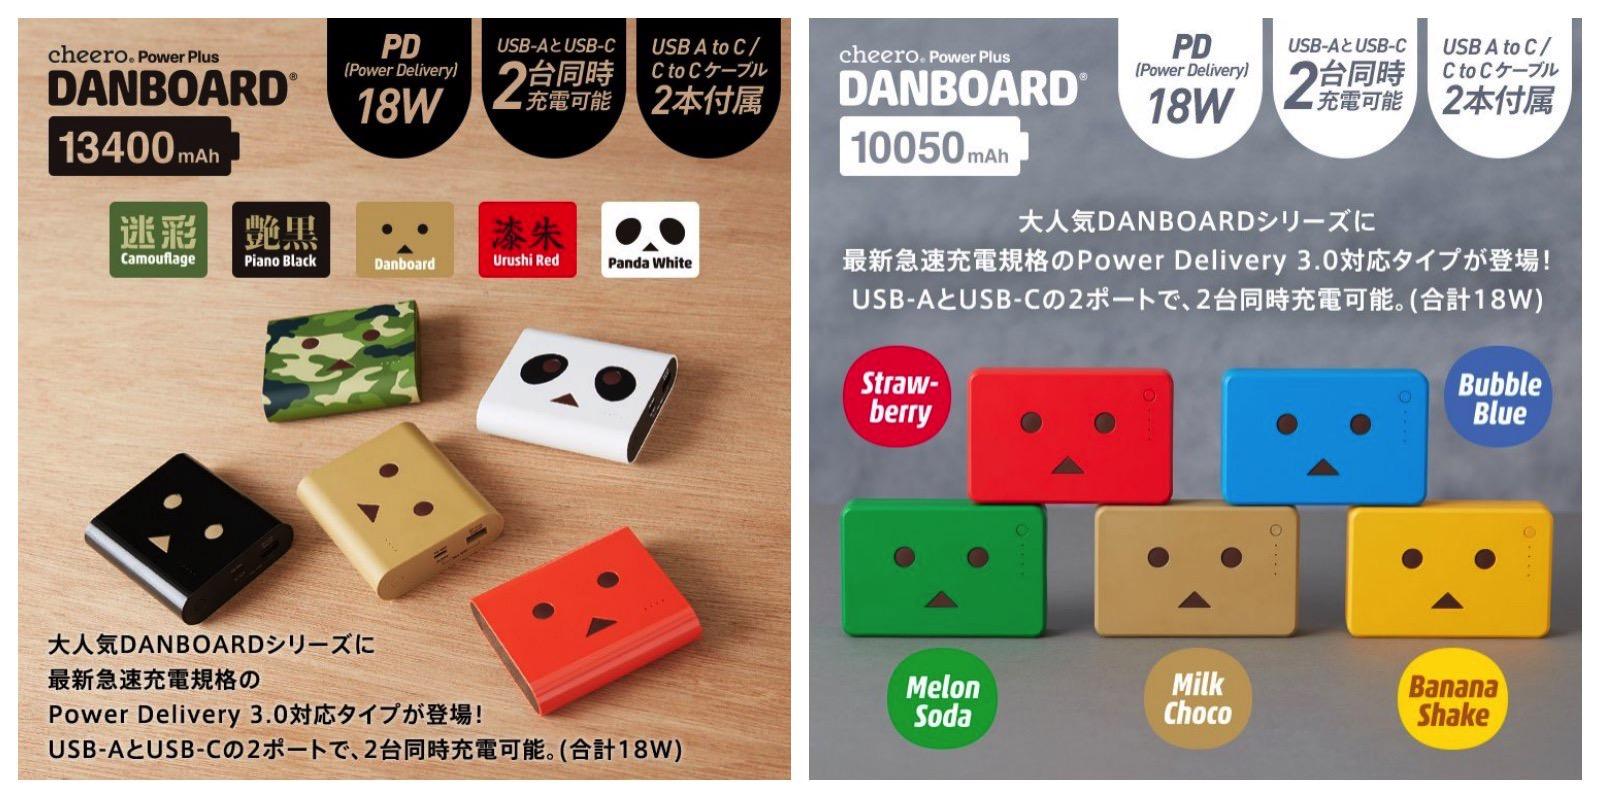 Cheero New Danboard Series